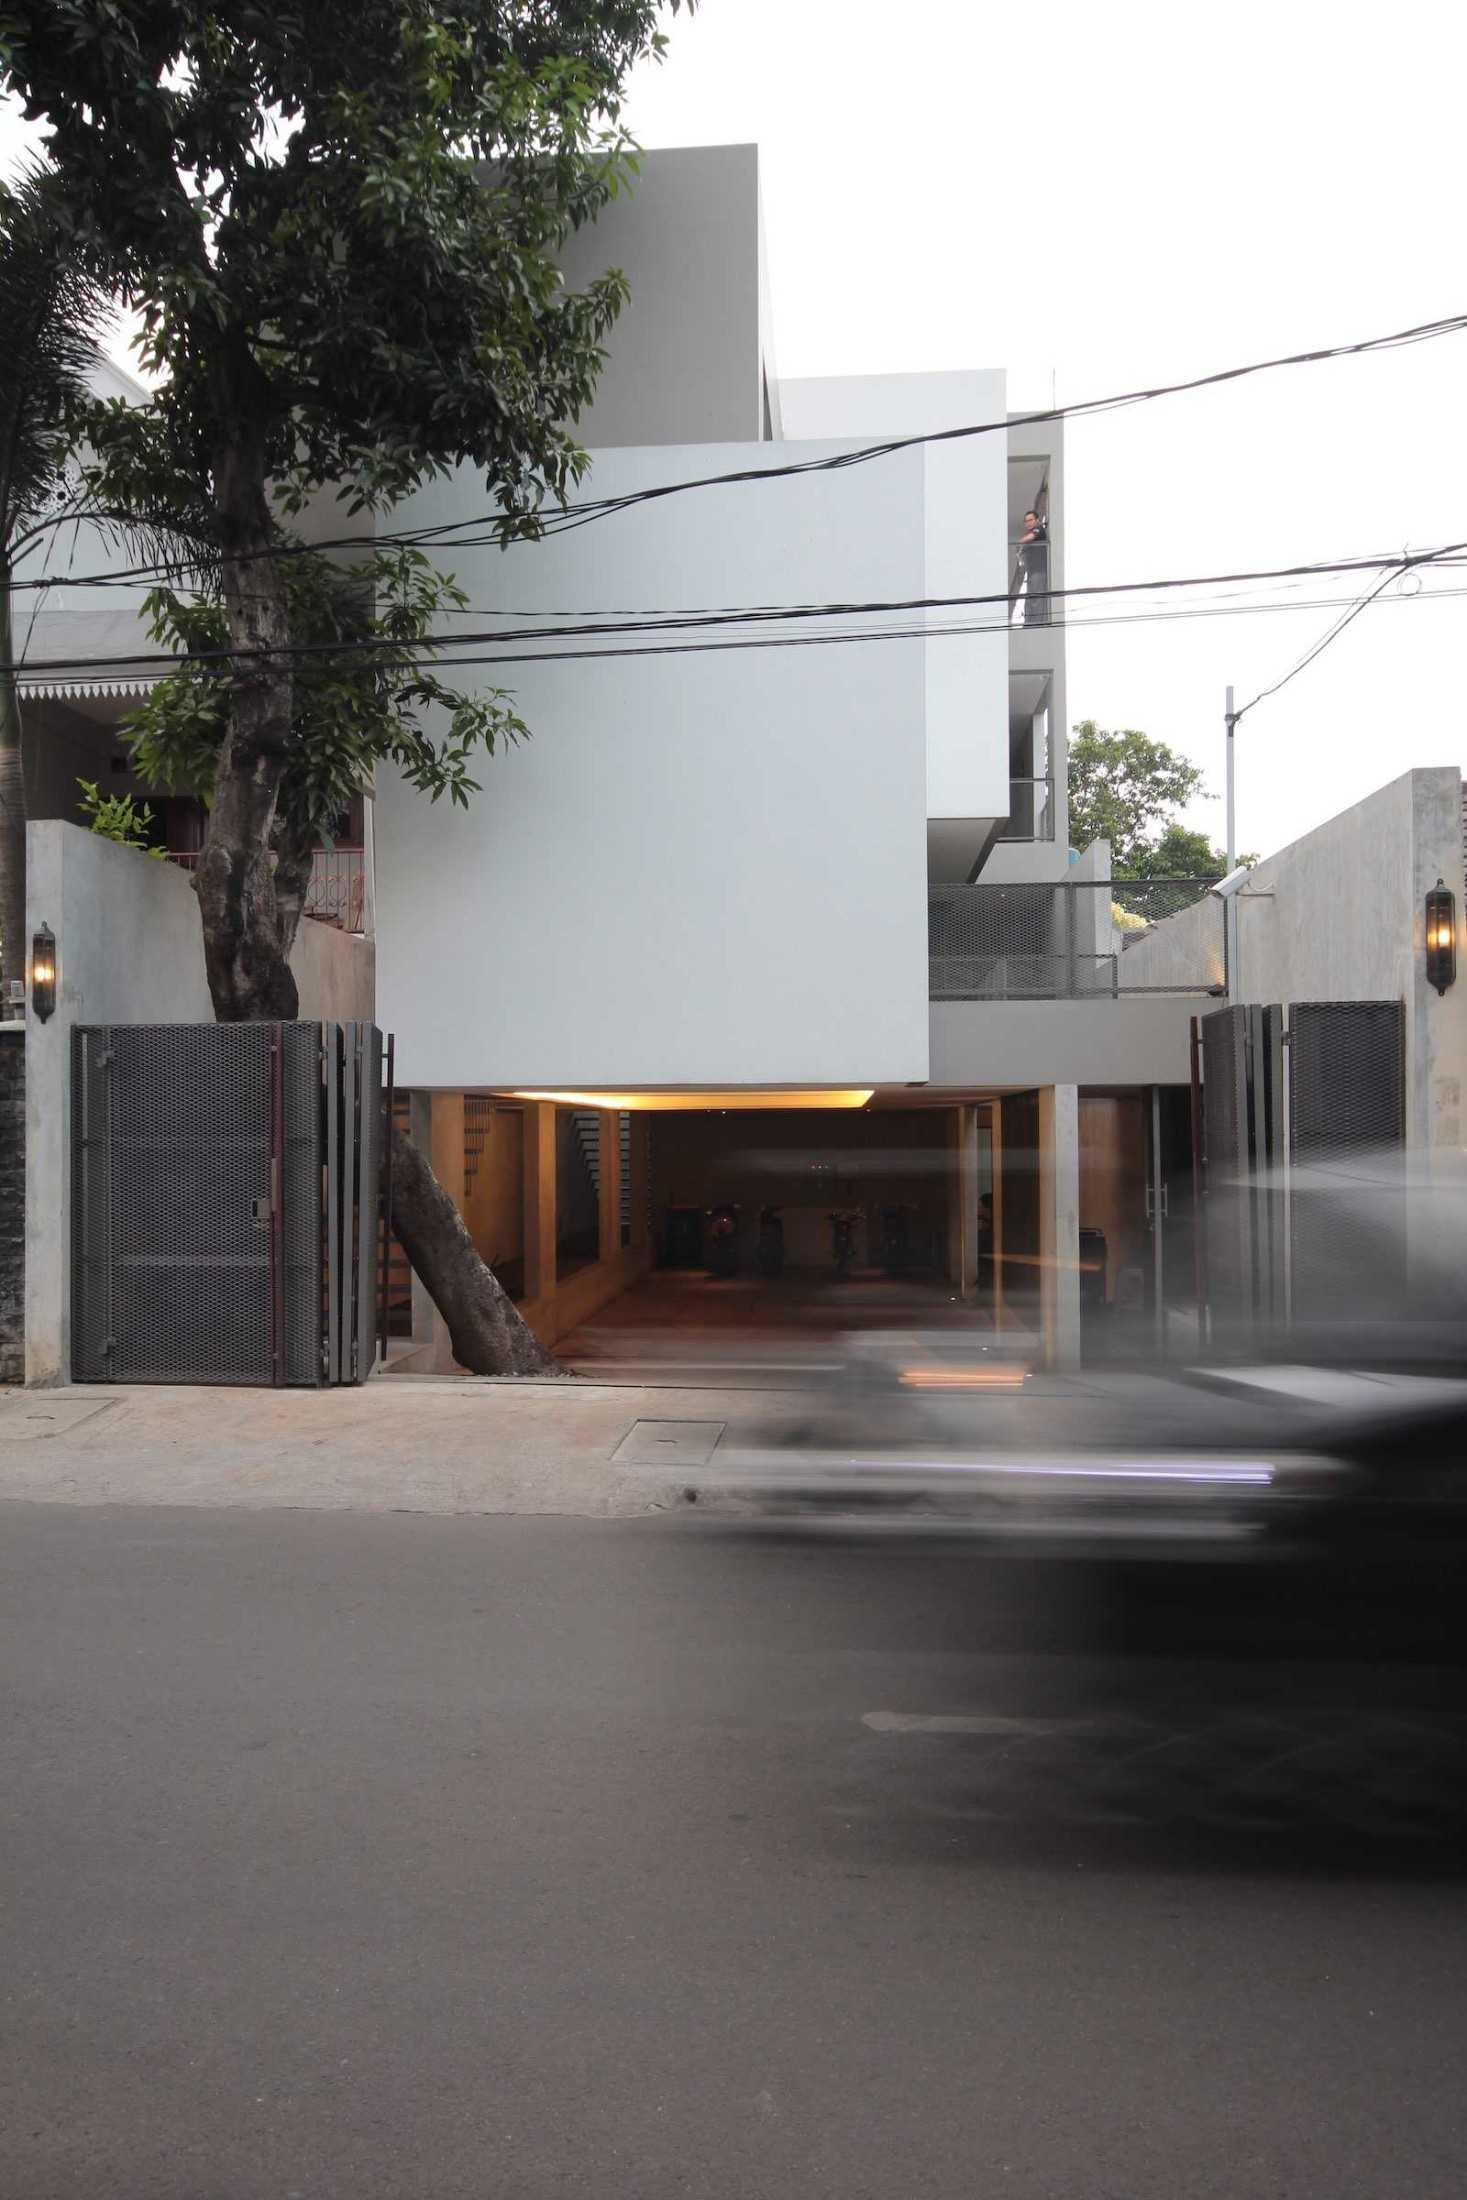 Armschitecture S Plot Housing Jakarta, Daerah Khusus Ibukota Jakarta, Indonesia Jakarta, Daerah Khusus Ibukota Jakarta, Indonesia Armschitecture-S-Plot-Housing Minimalist 65857